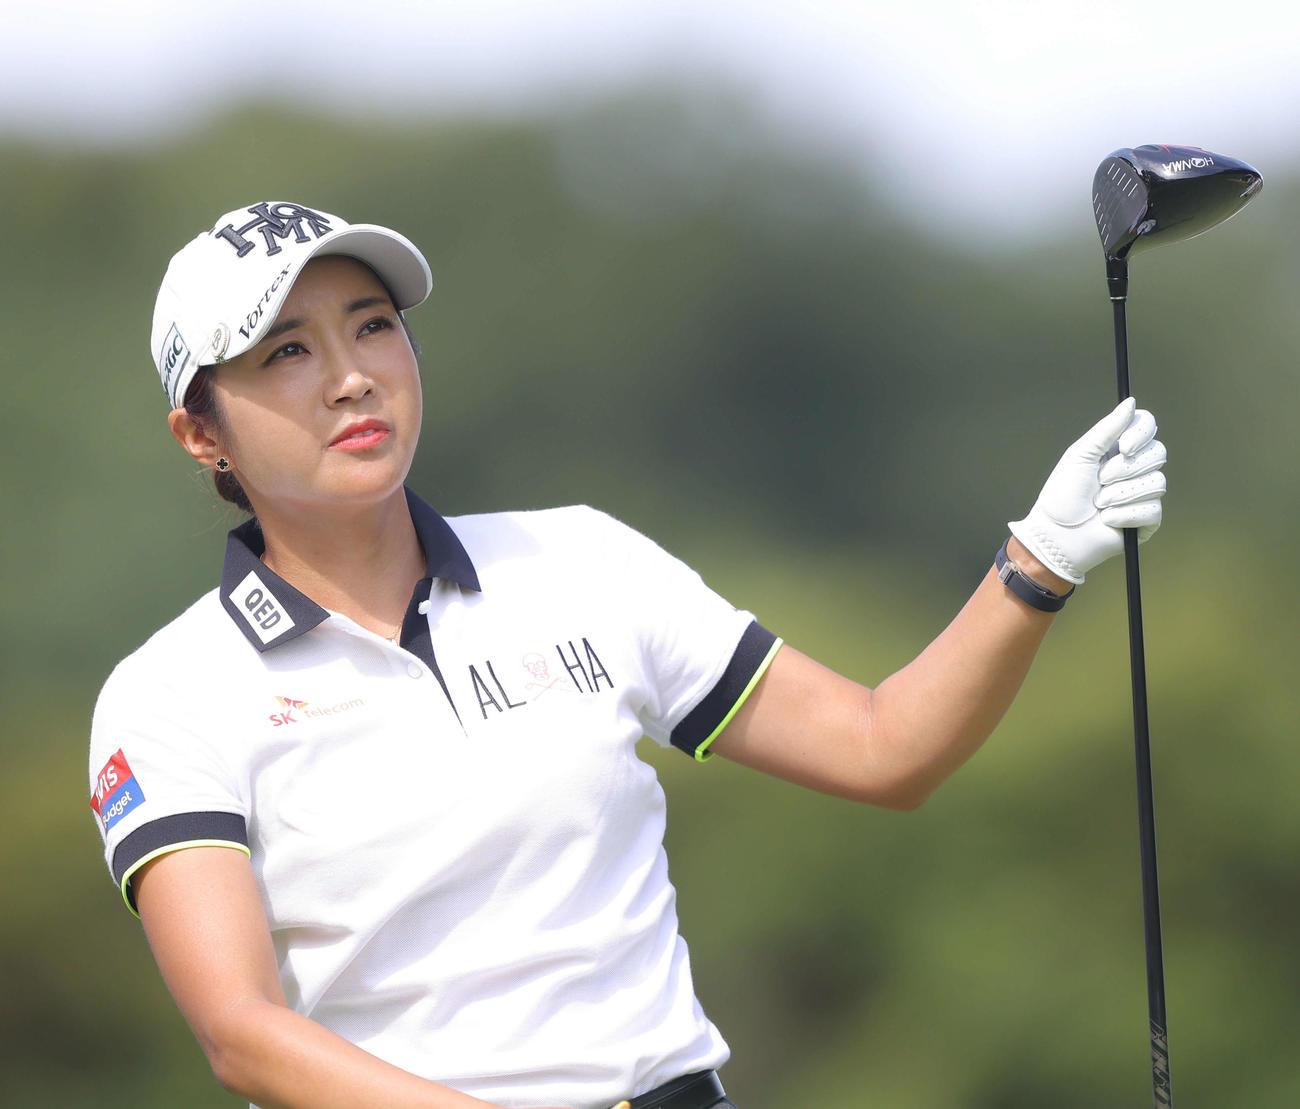 https://www.nikkansports.com/sports/golf/news/img/202106270000151-w1300_13.jpg